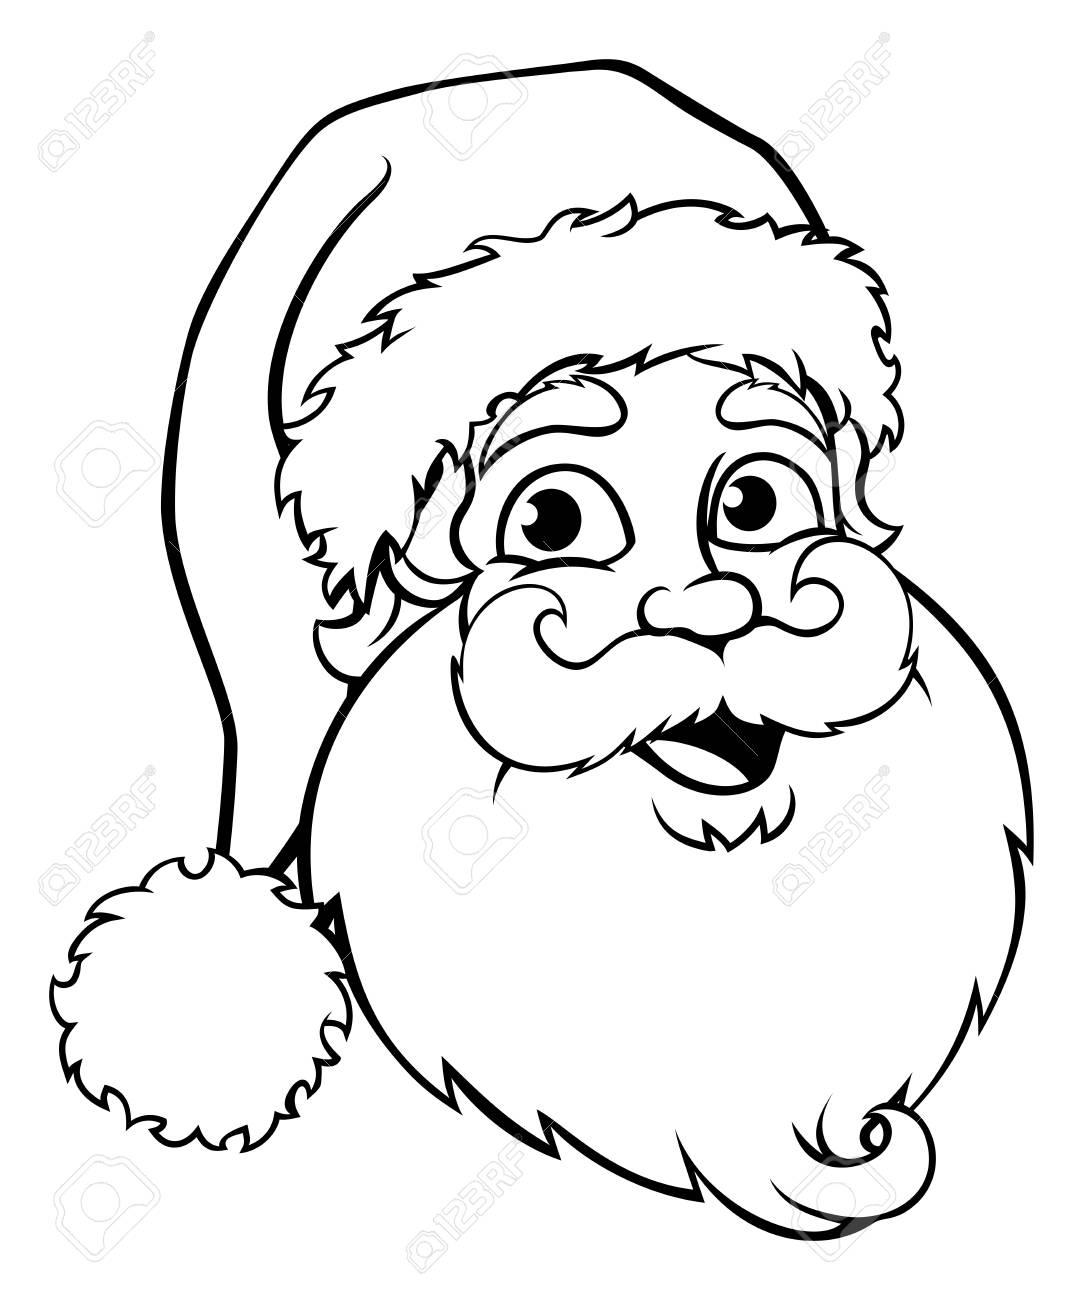 1083x1300 A Santa Claus Cartoon Character Christmas Black And White